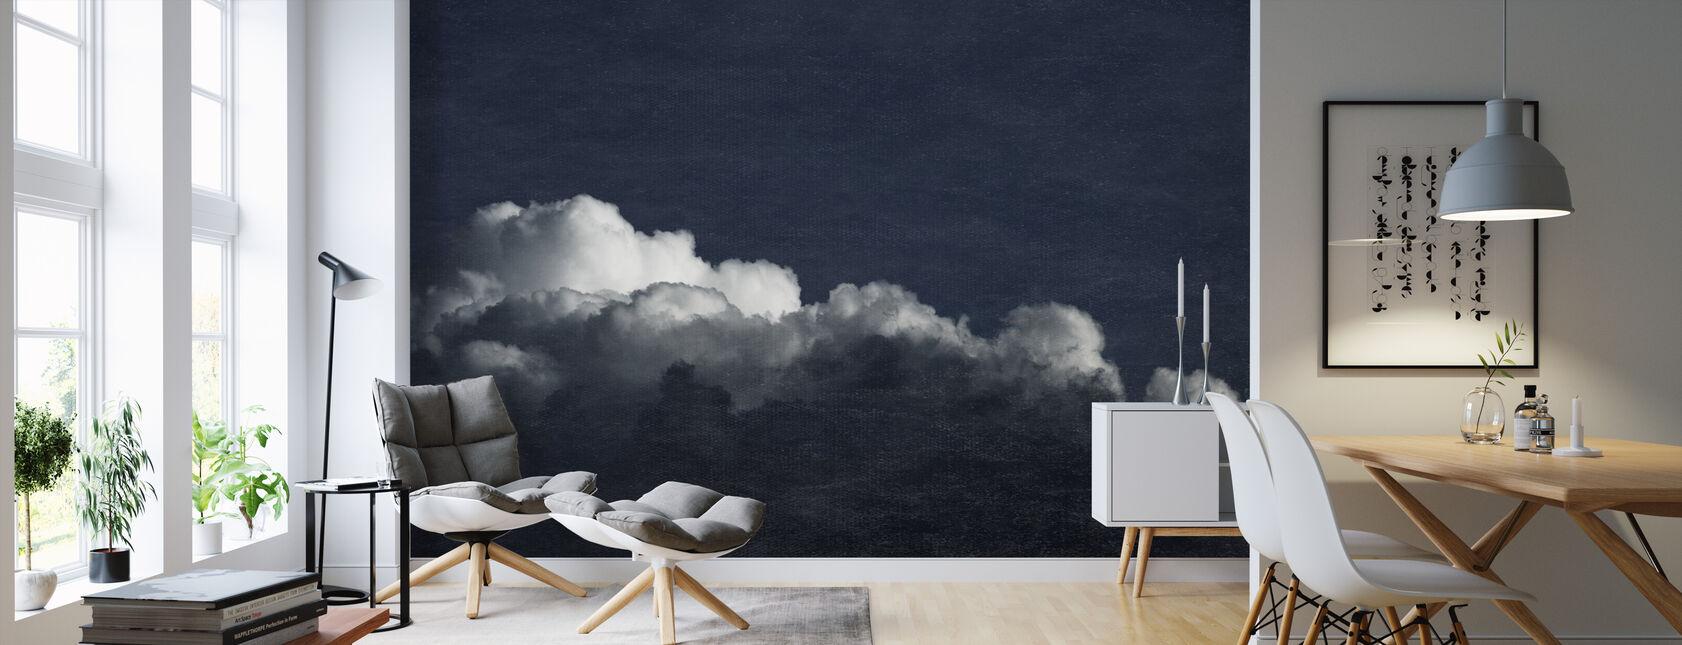 Gradient Cloud Dark Blue Filter - Wallpaper - Living Room